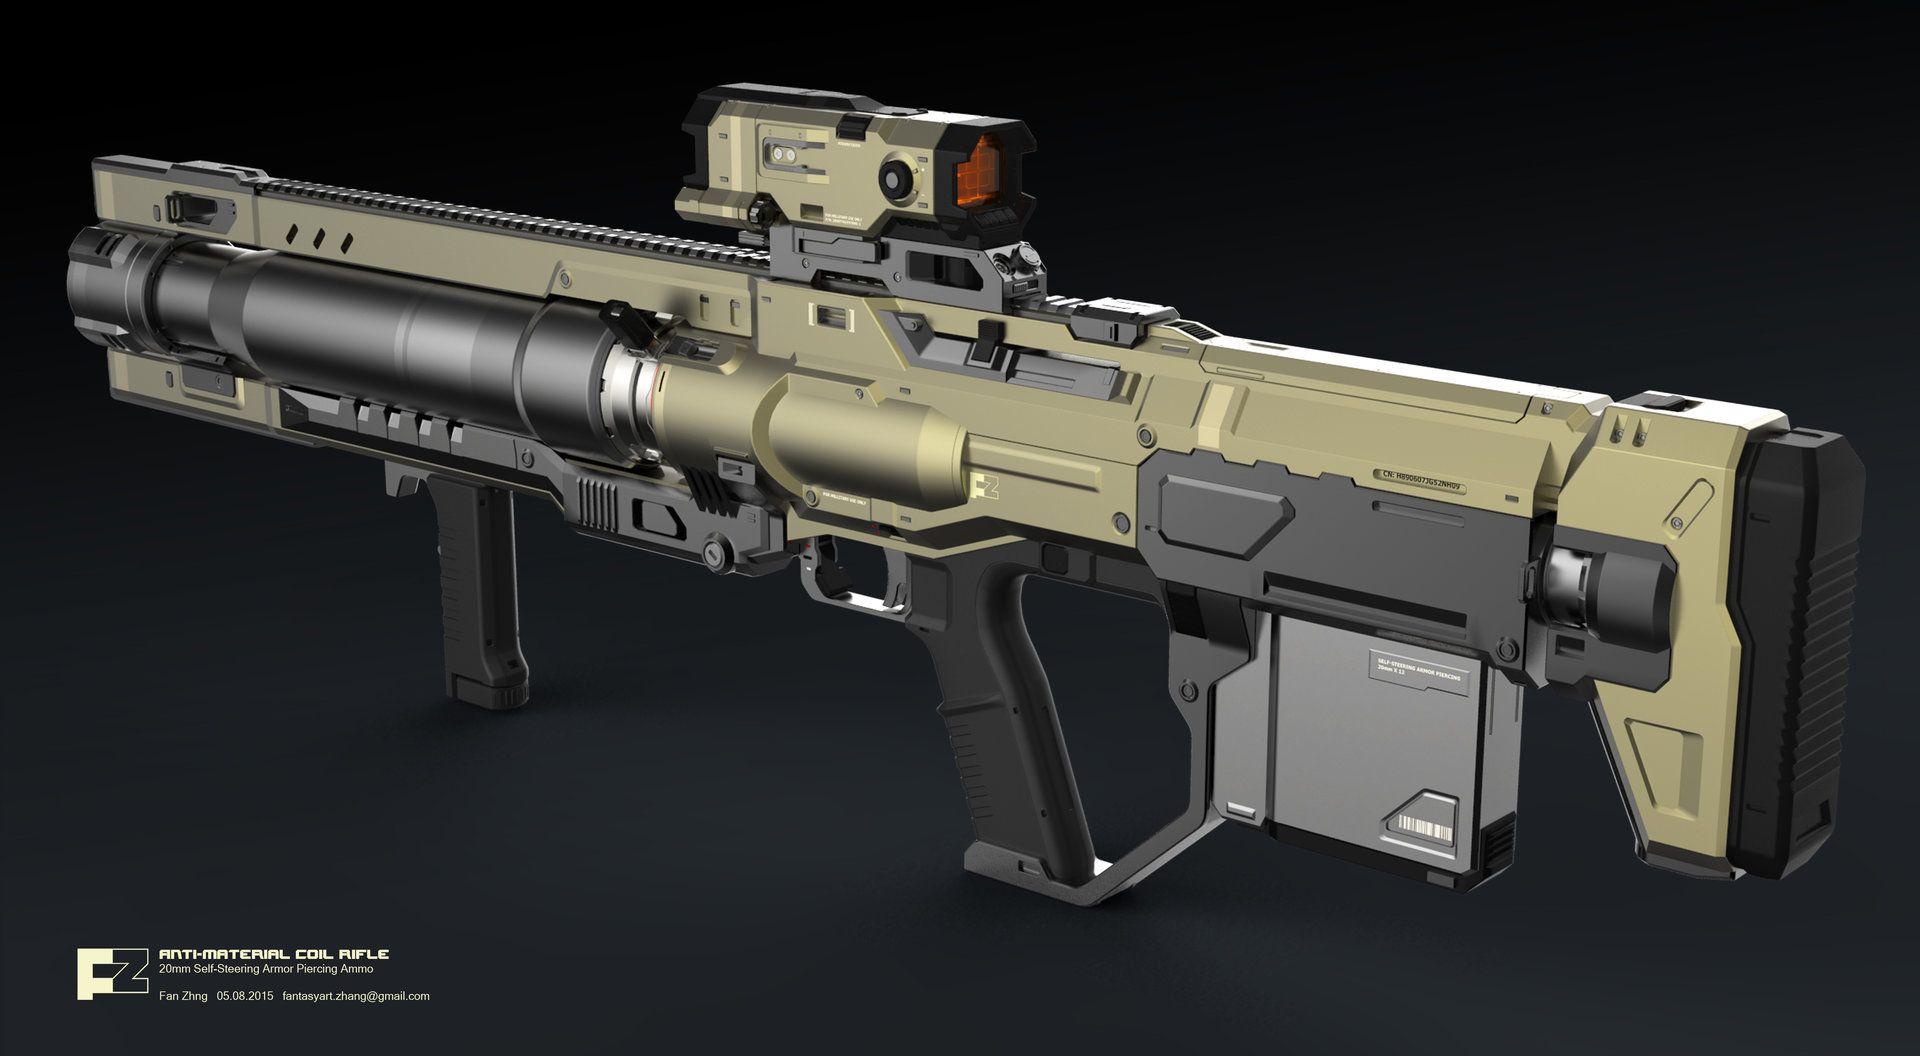 Shooting Material: ANTI-MATERIAL COIL RIFLE 20mm Self-Steering Armor Piercing